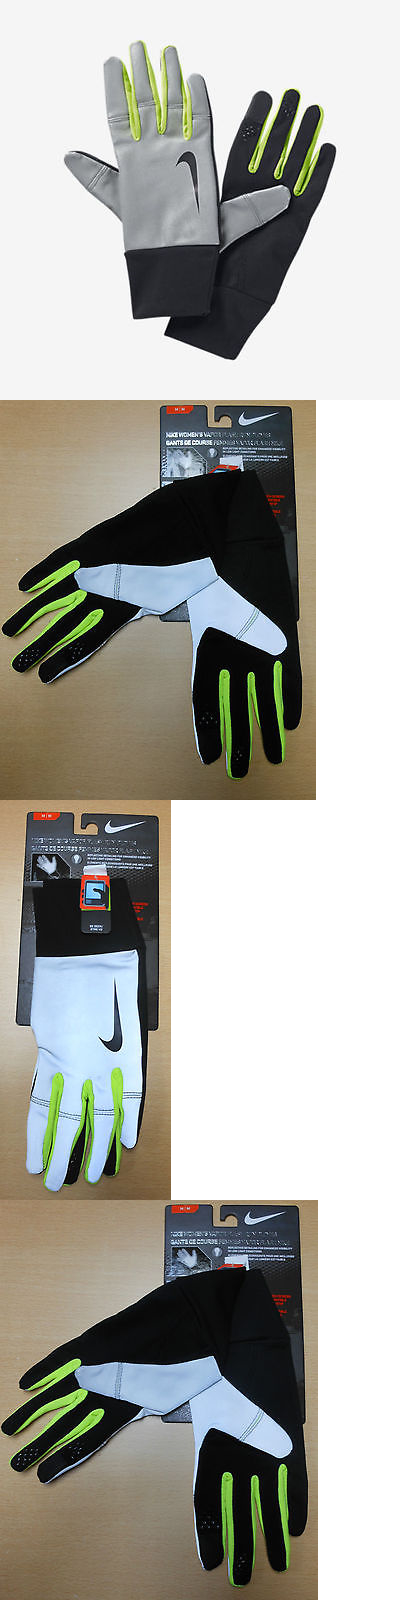 Running Gloves 179810: Nike Size L/G Vapor Flash Womens Running Gloves New  $65